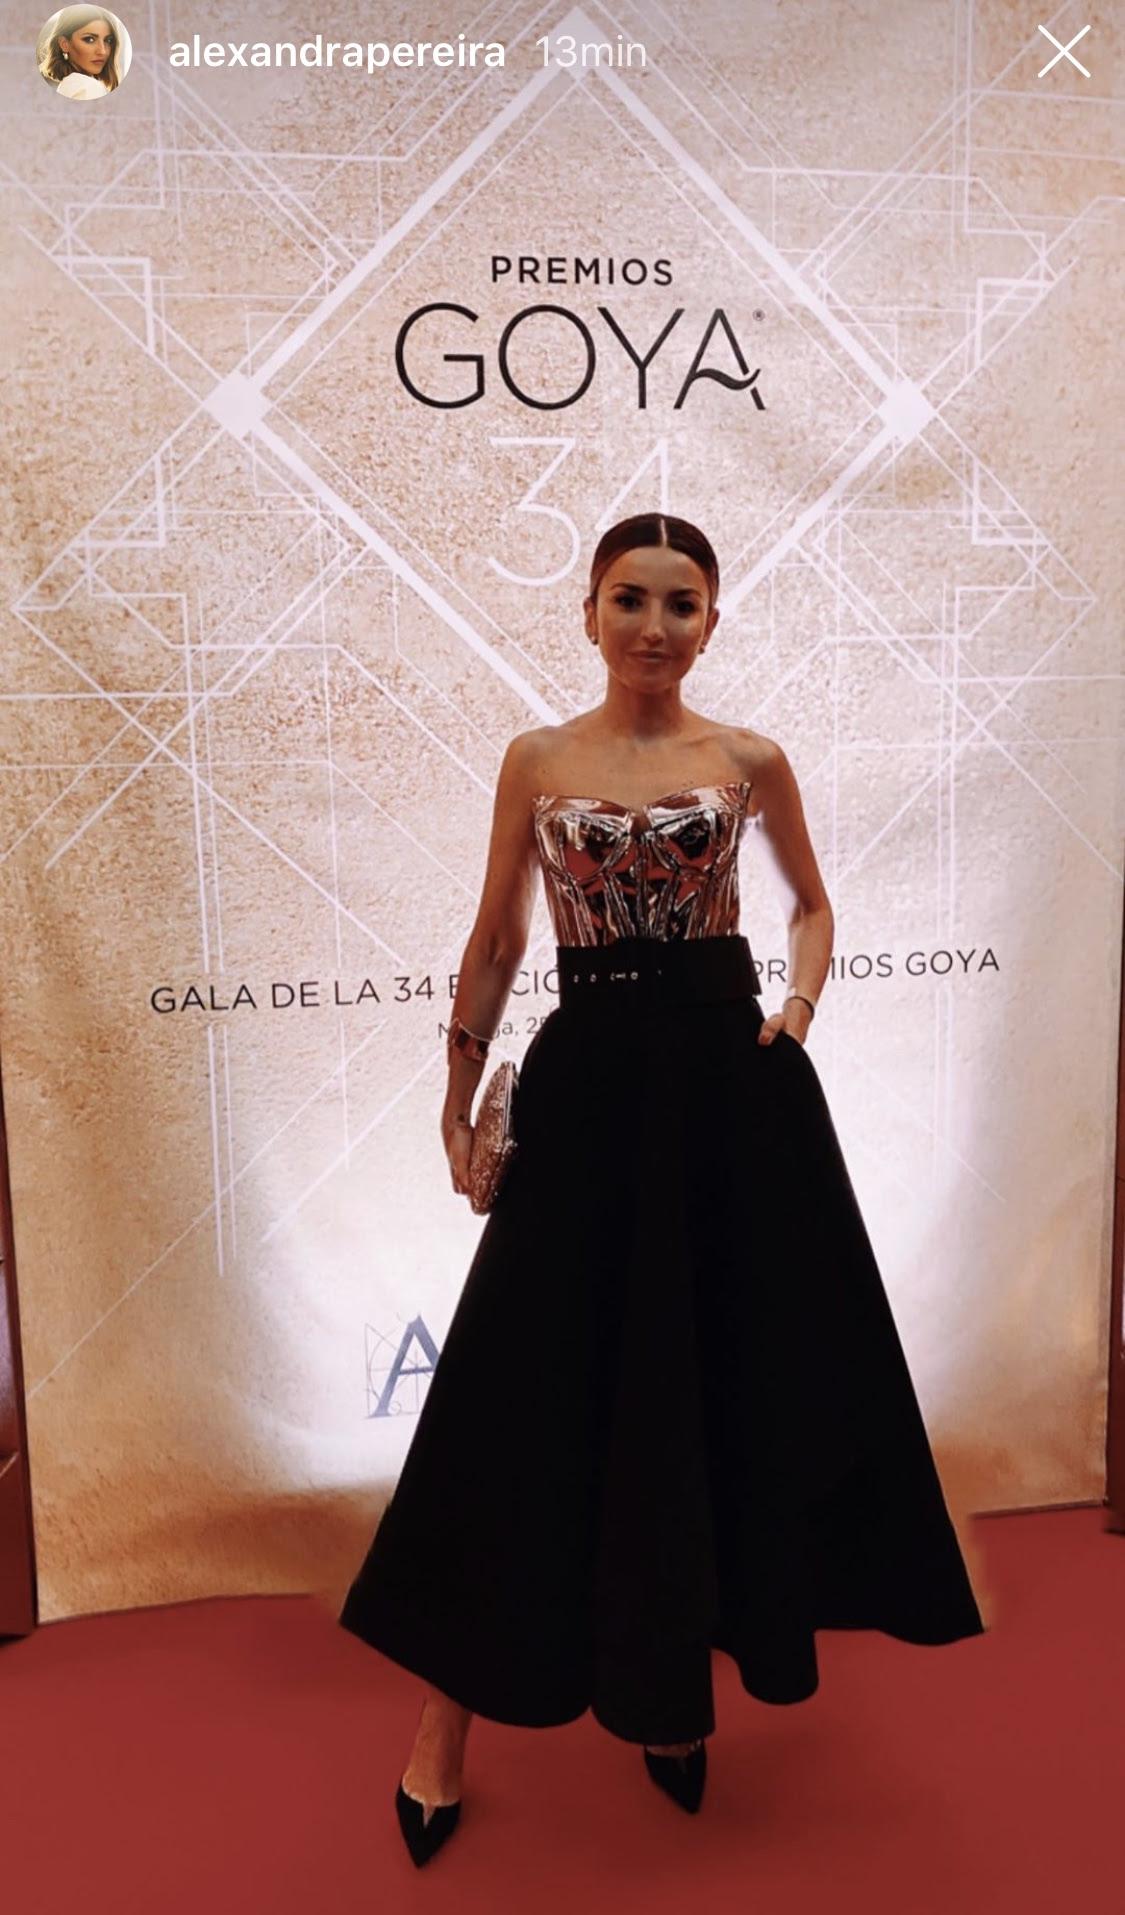 a06fbc79 8a92 47ac 9622 d610e759084b - Premios Goya 2020 : Looks de todas las celebrities que lucieron  marcas de Replica